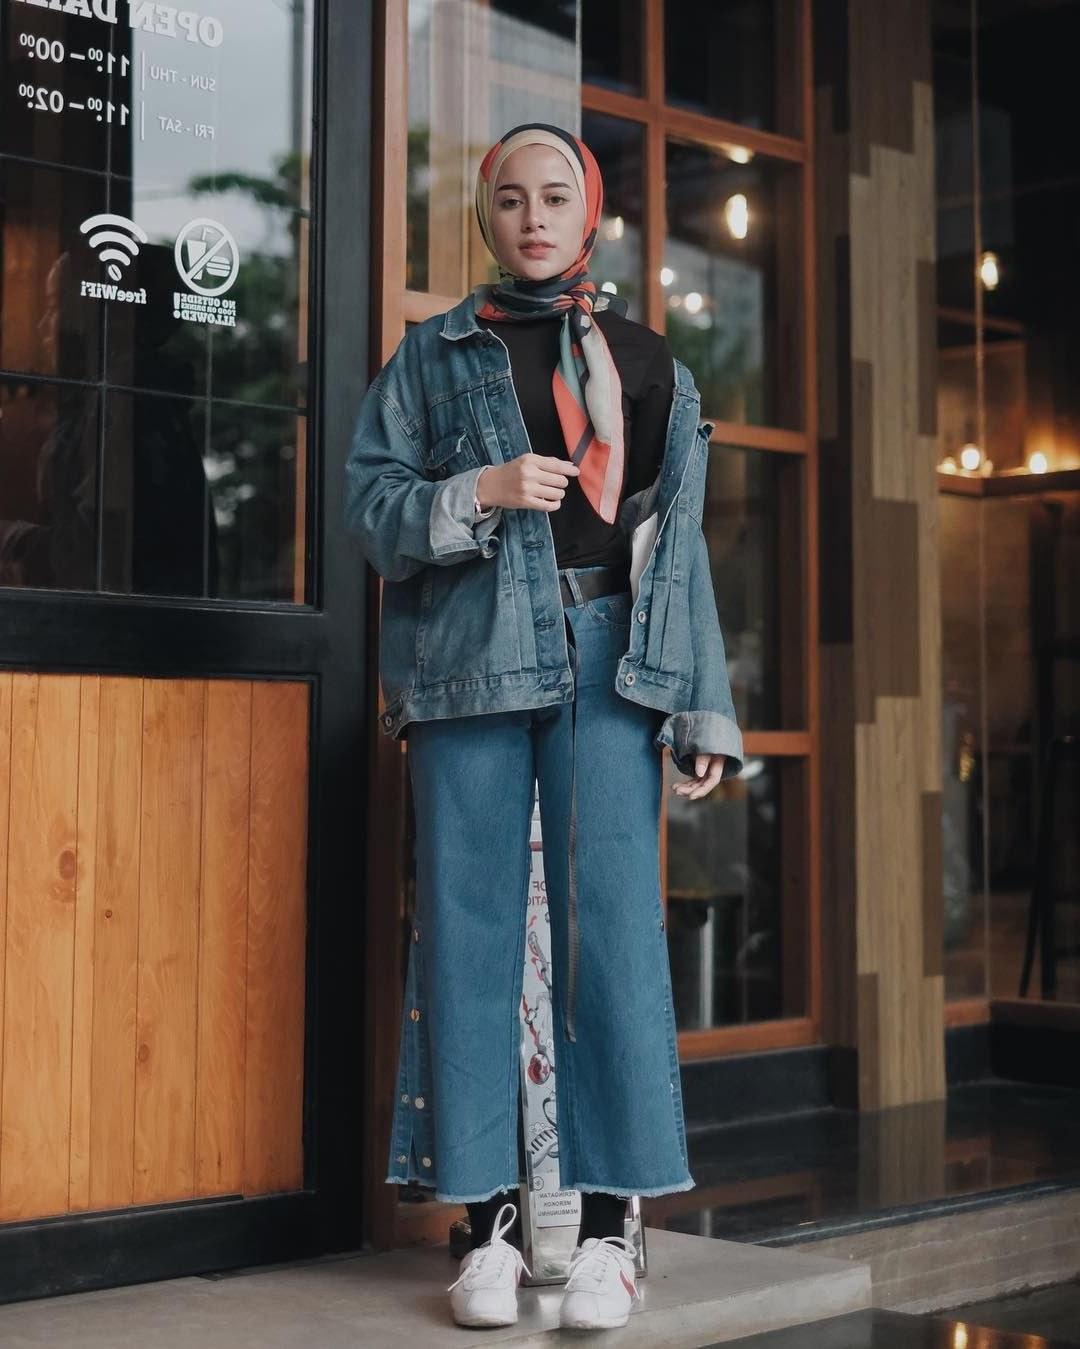 Design Ootd Baju Lebaran Remaja 2020 Nkde Outfit Baju Remaja Berhijab Ala Selebgram 2018 Longpants